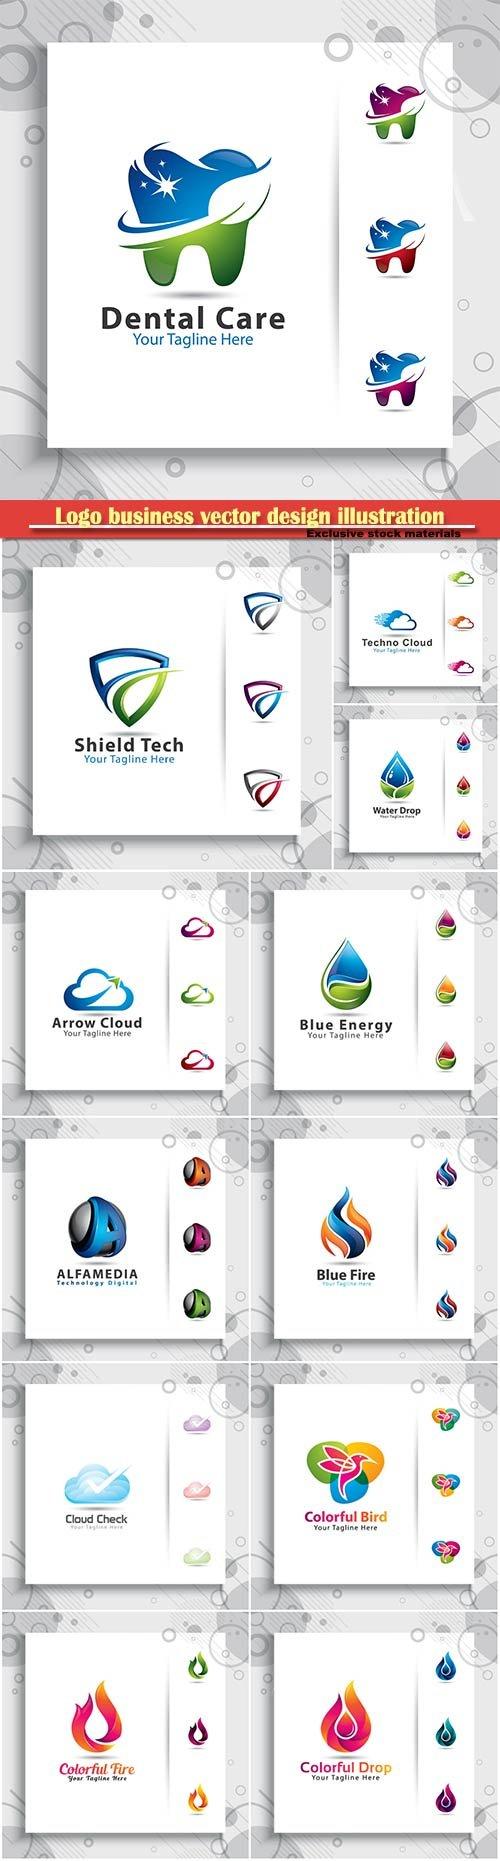 Logo business vector design illustration